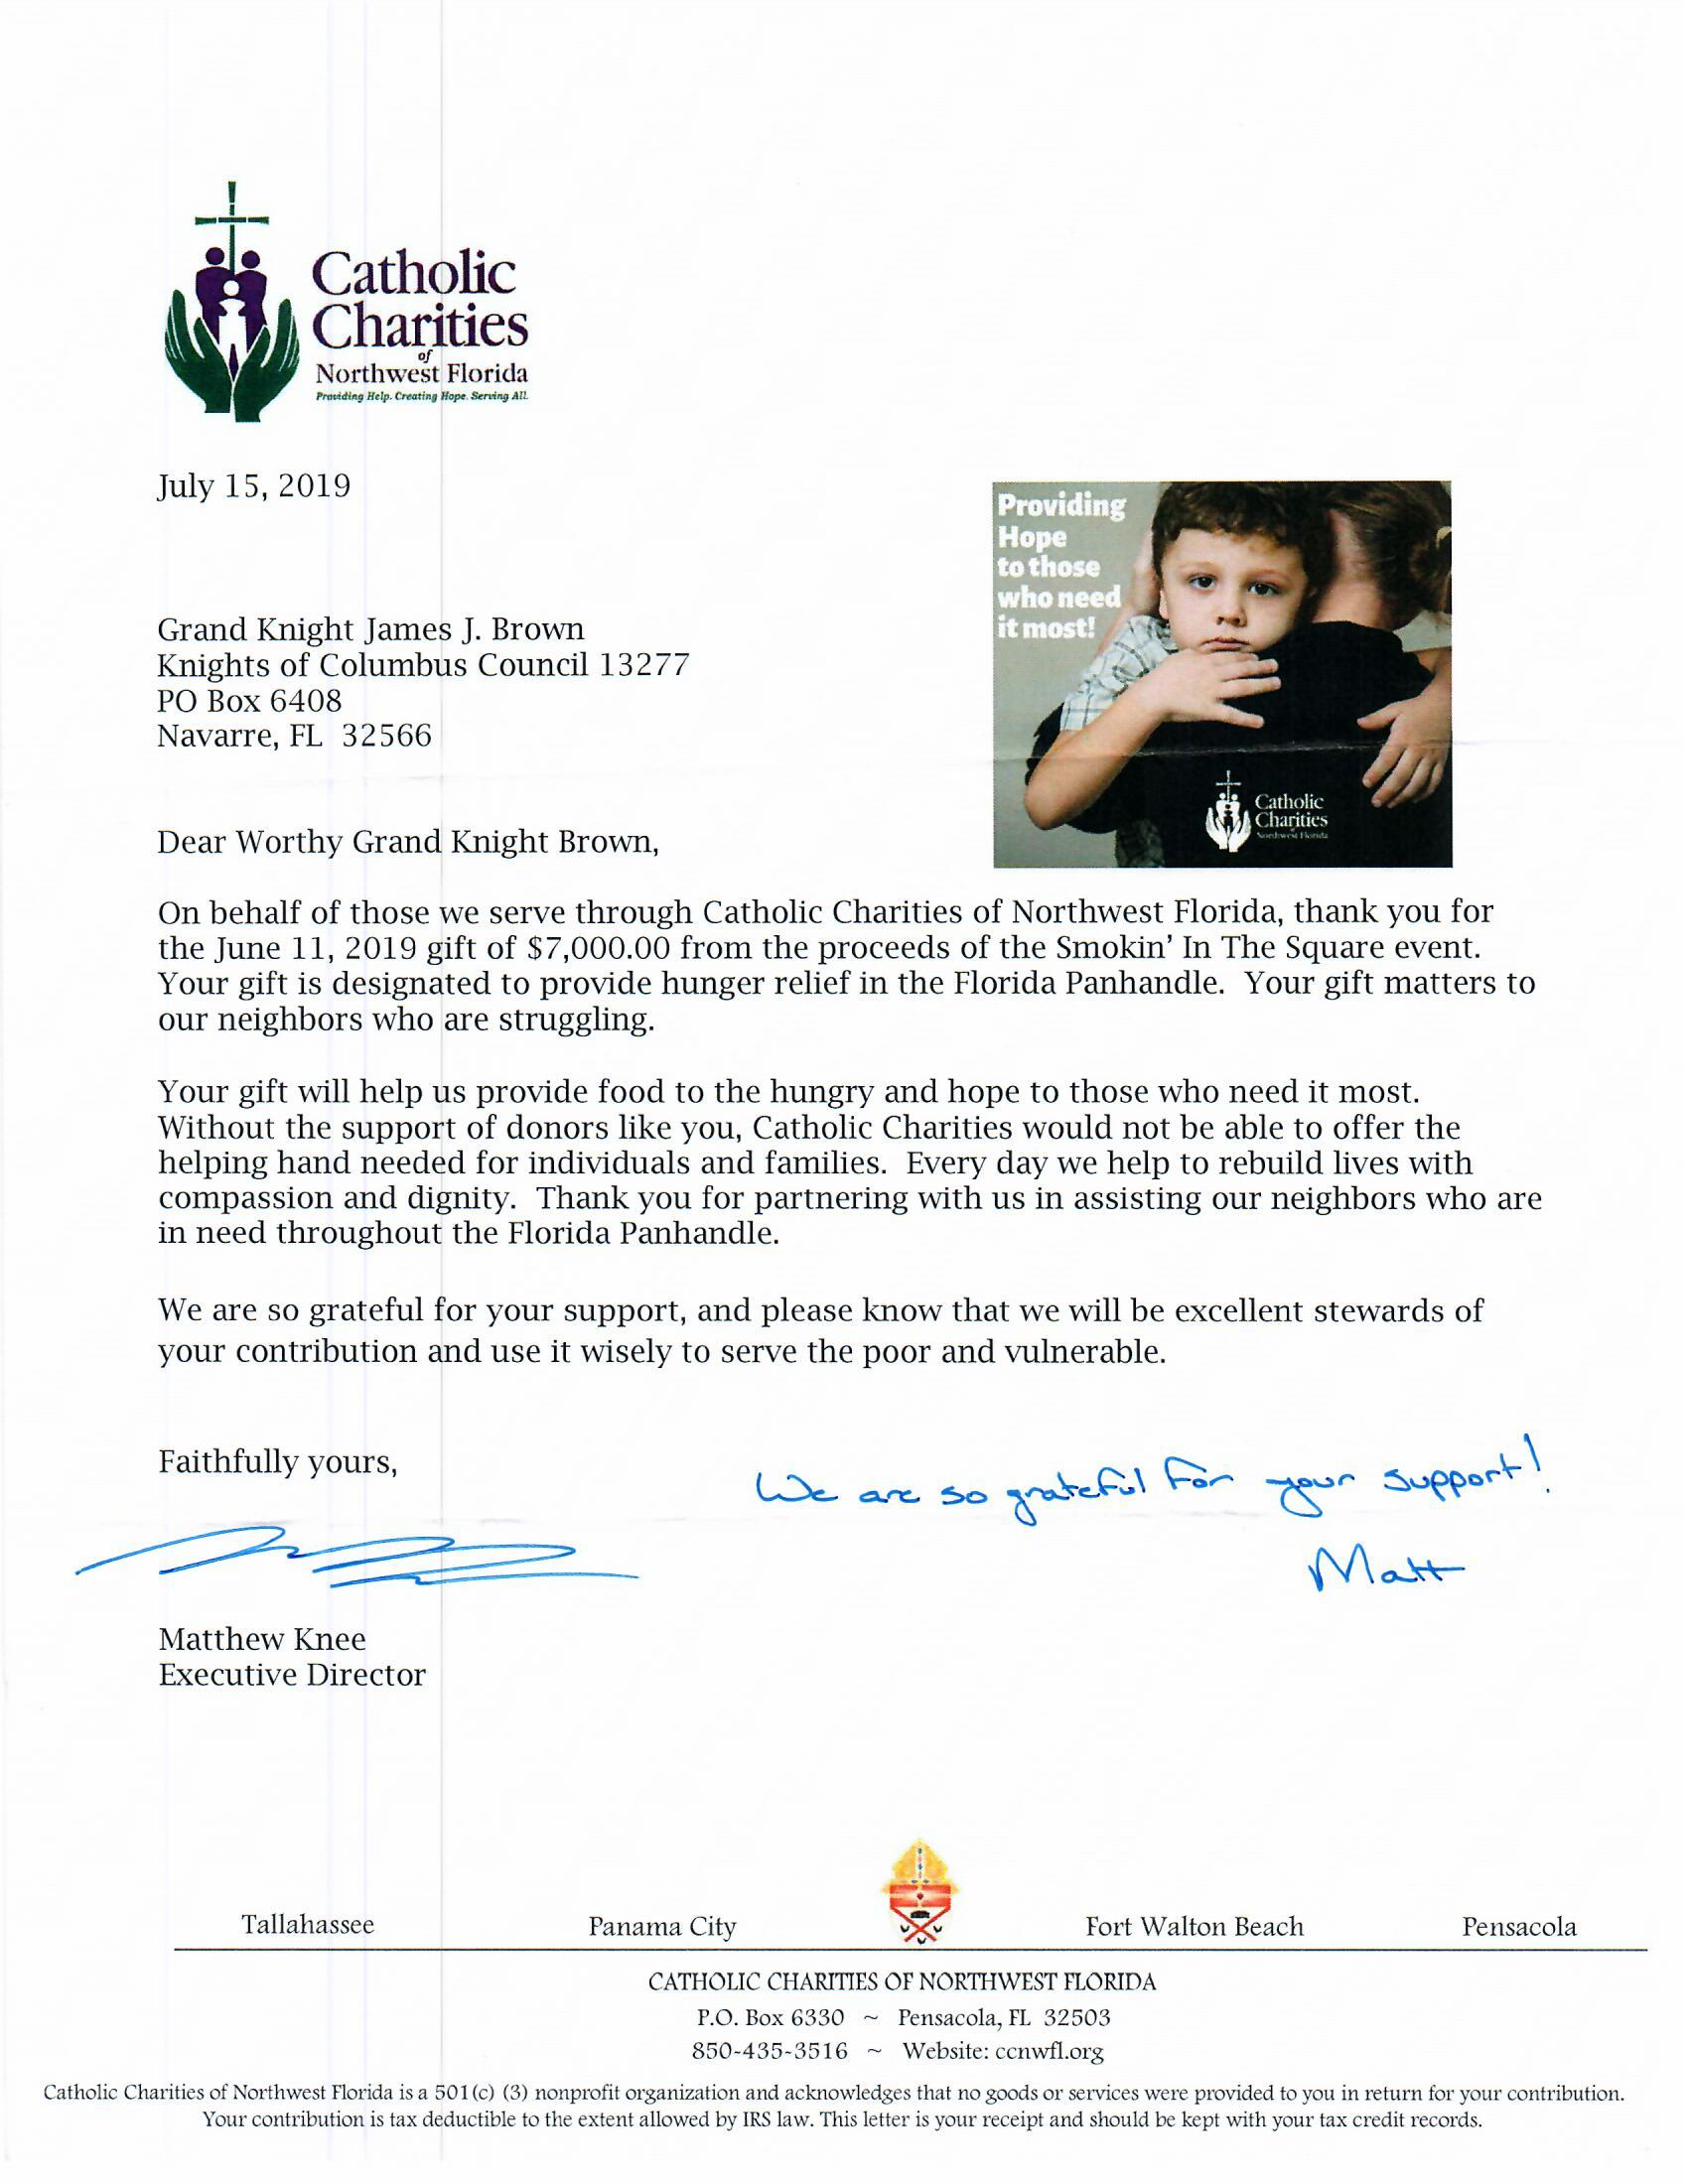 20190715 Catholic Charities of NW Florida.jpg